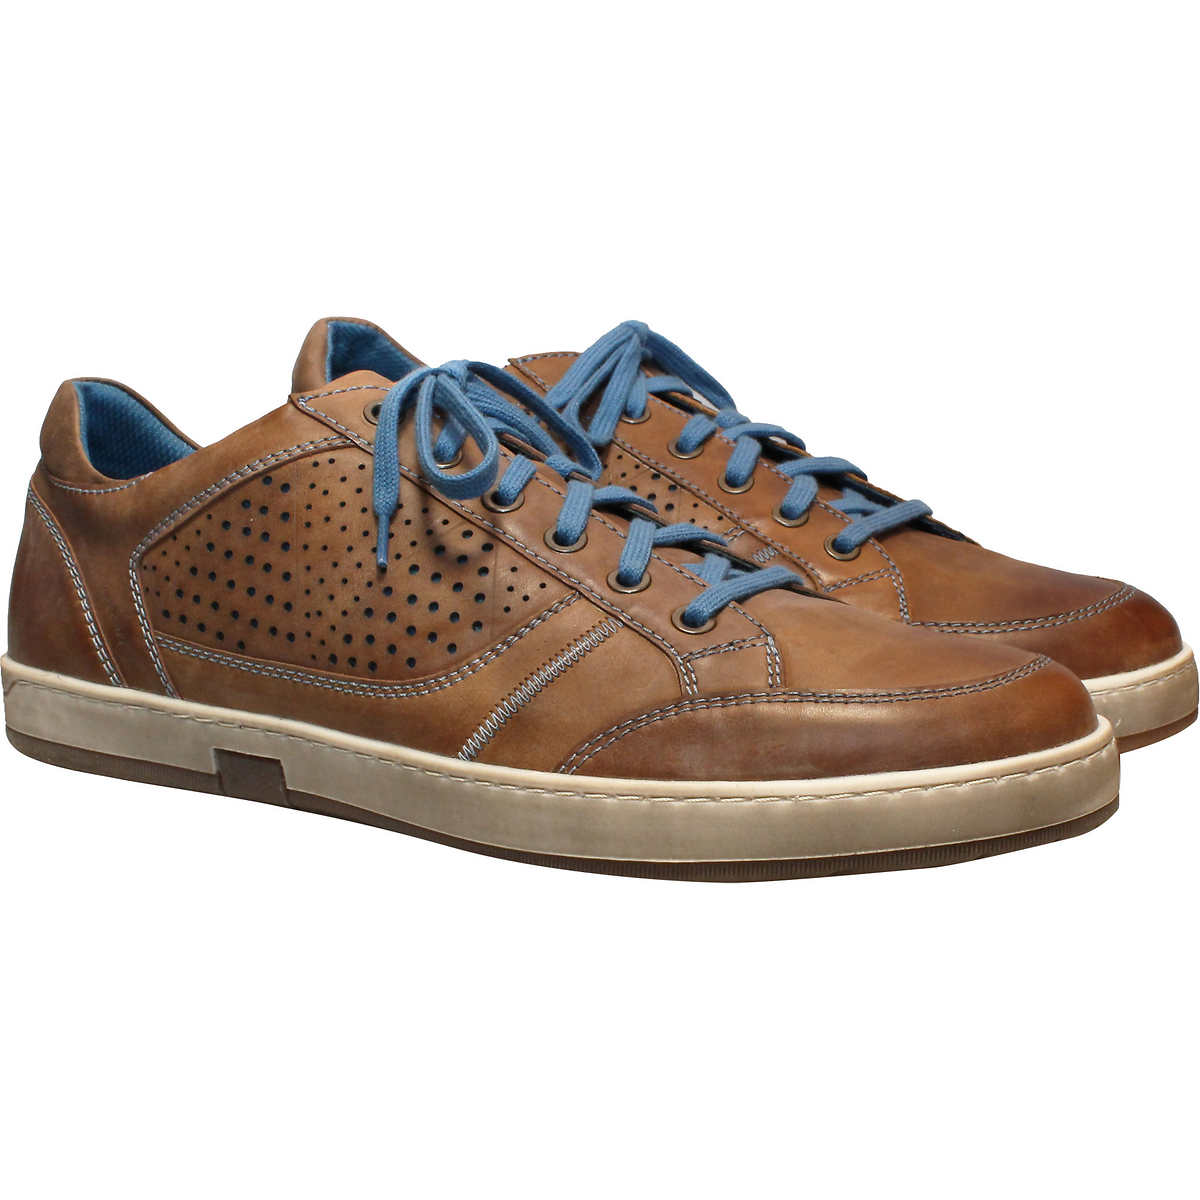 Skate shoes edinburgh - Josef Seibel Gatteo 12 Men S Brown Sports Casual Shoe